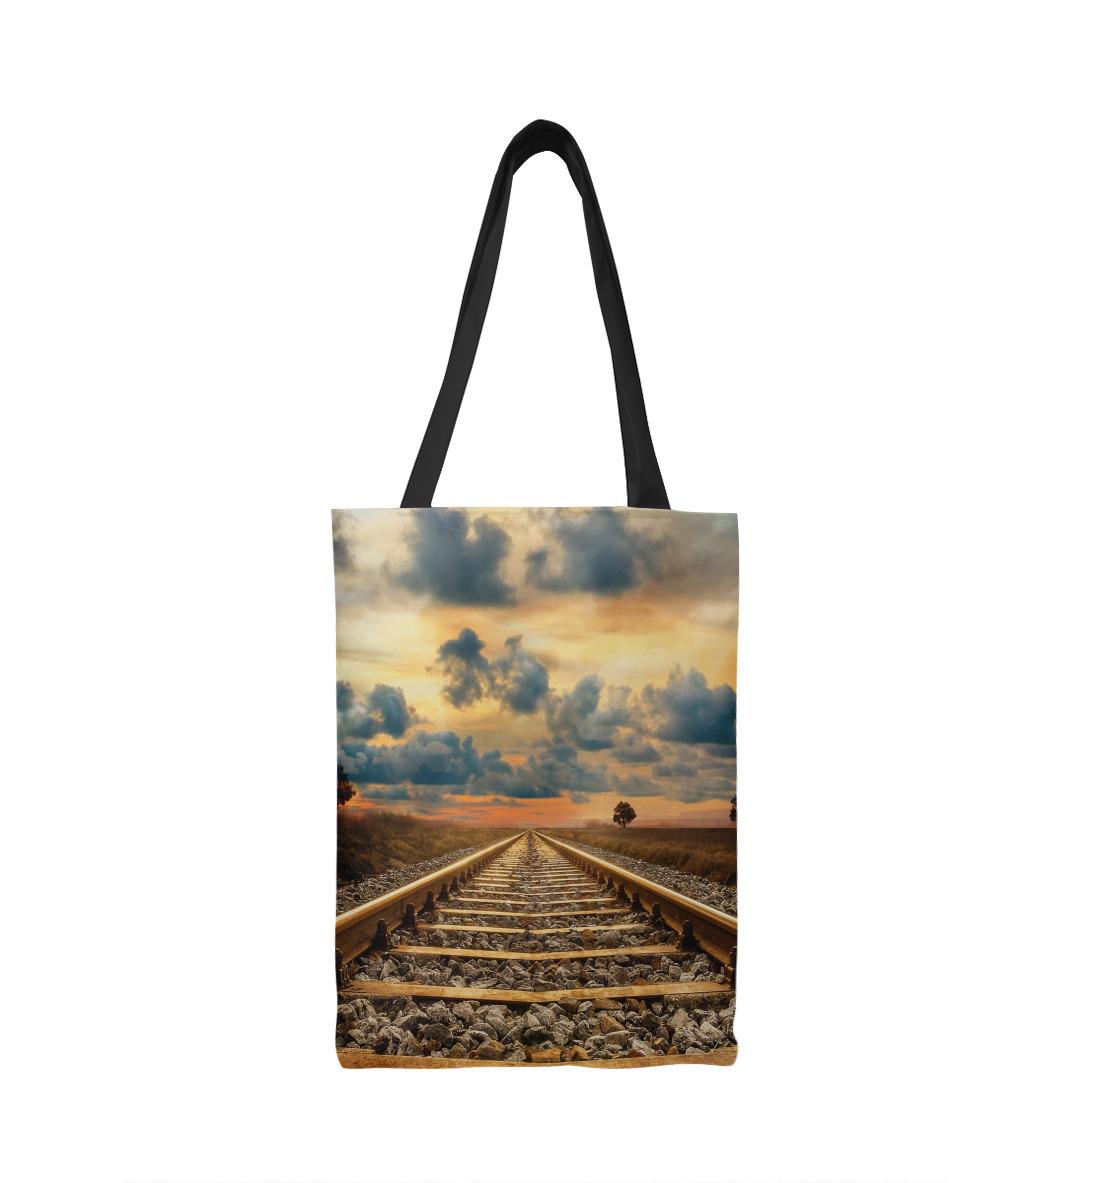 Фото - Железная дорога детская железная дорога noname детская железная дорога